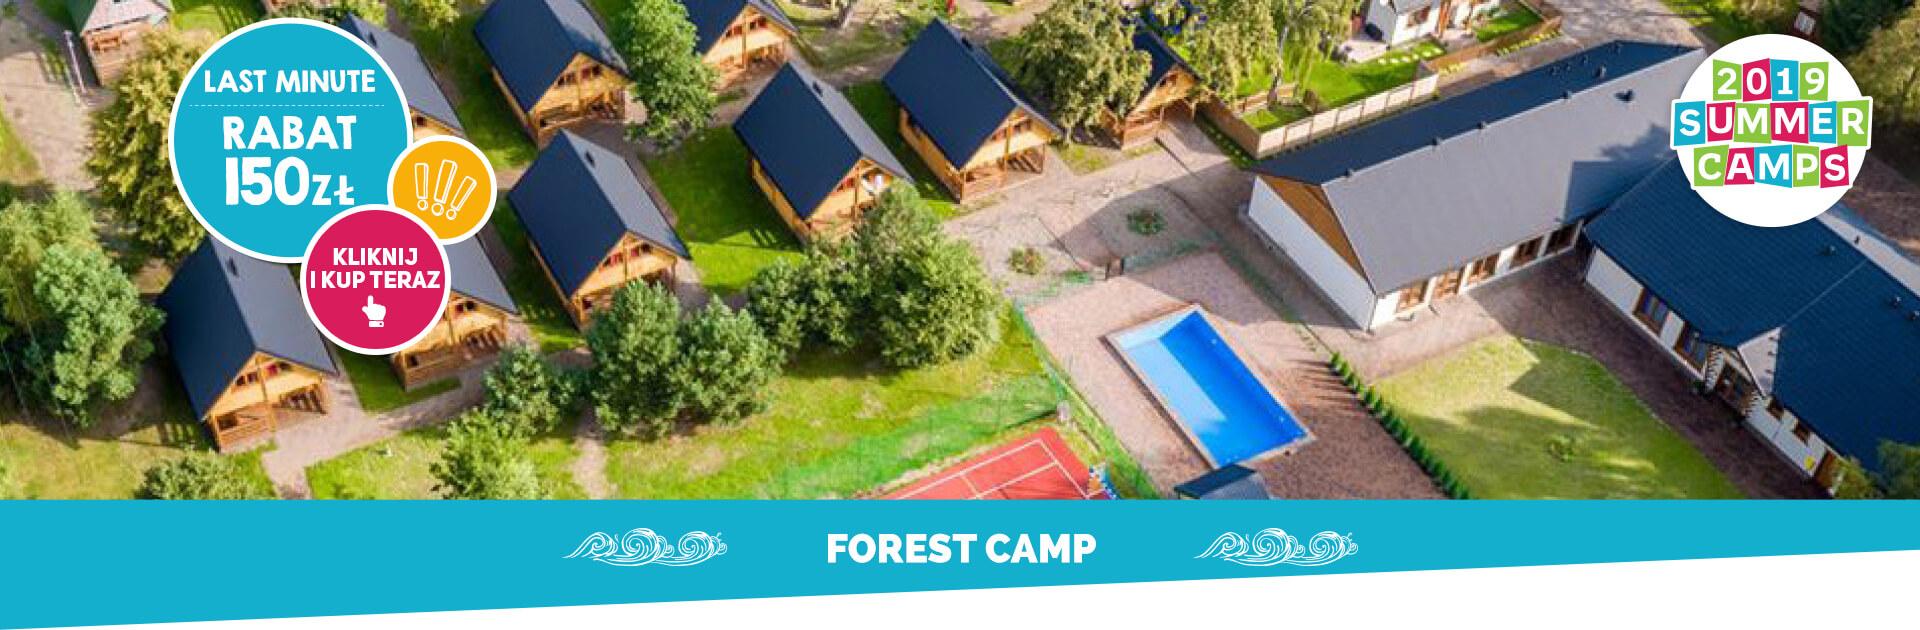 banner_gora_edit_maj_forest_